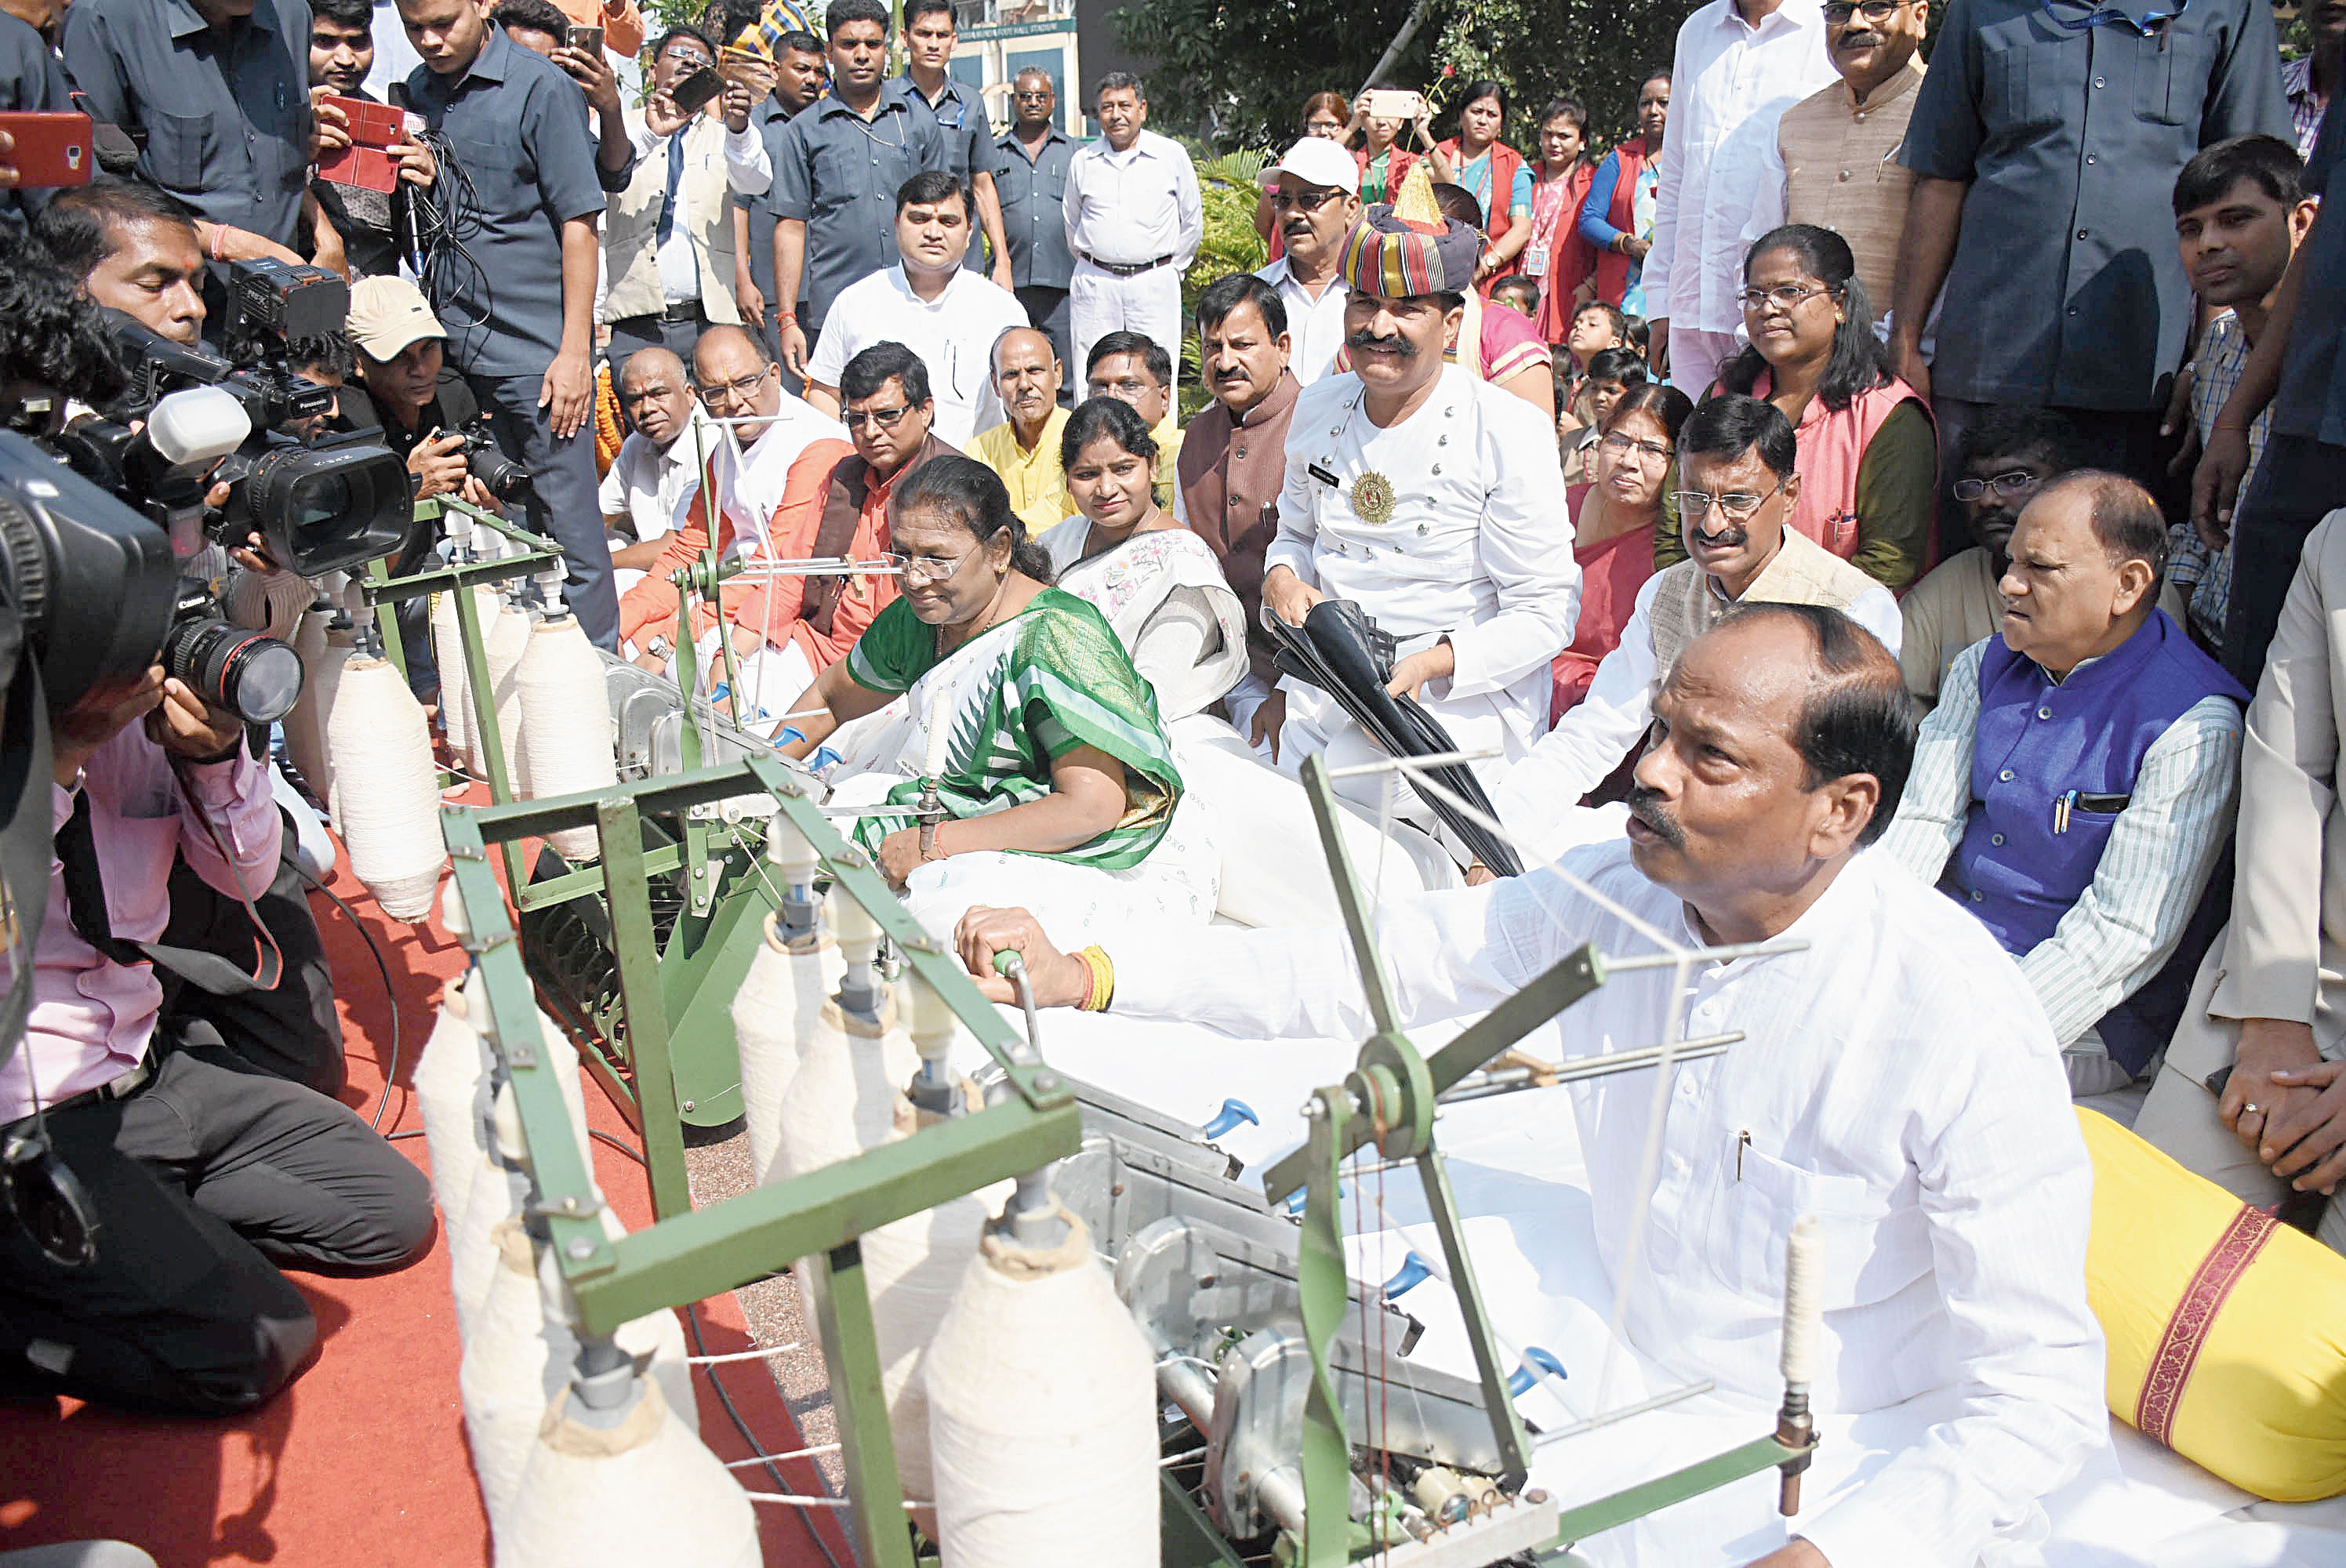 Governor Droupadi Murmu and CM Raghubar Das spin the charkha in Morabadi, Ranchi, on Wednesday.